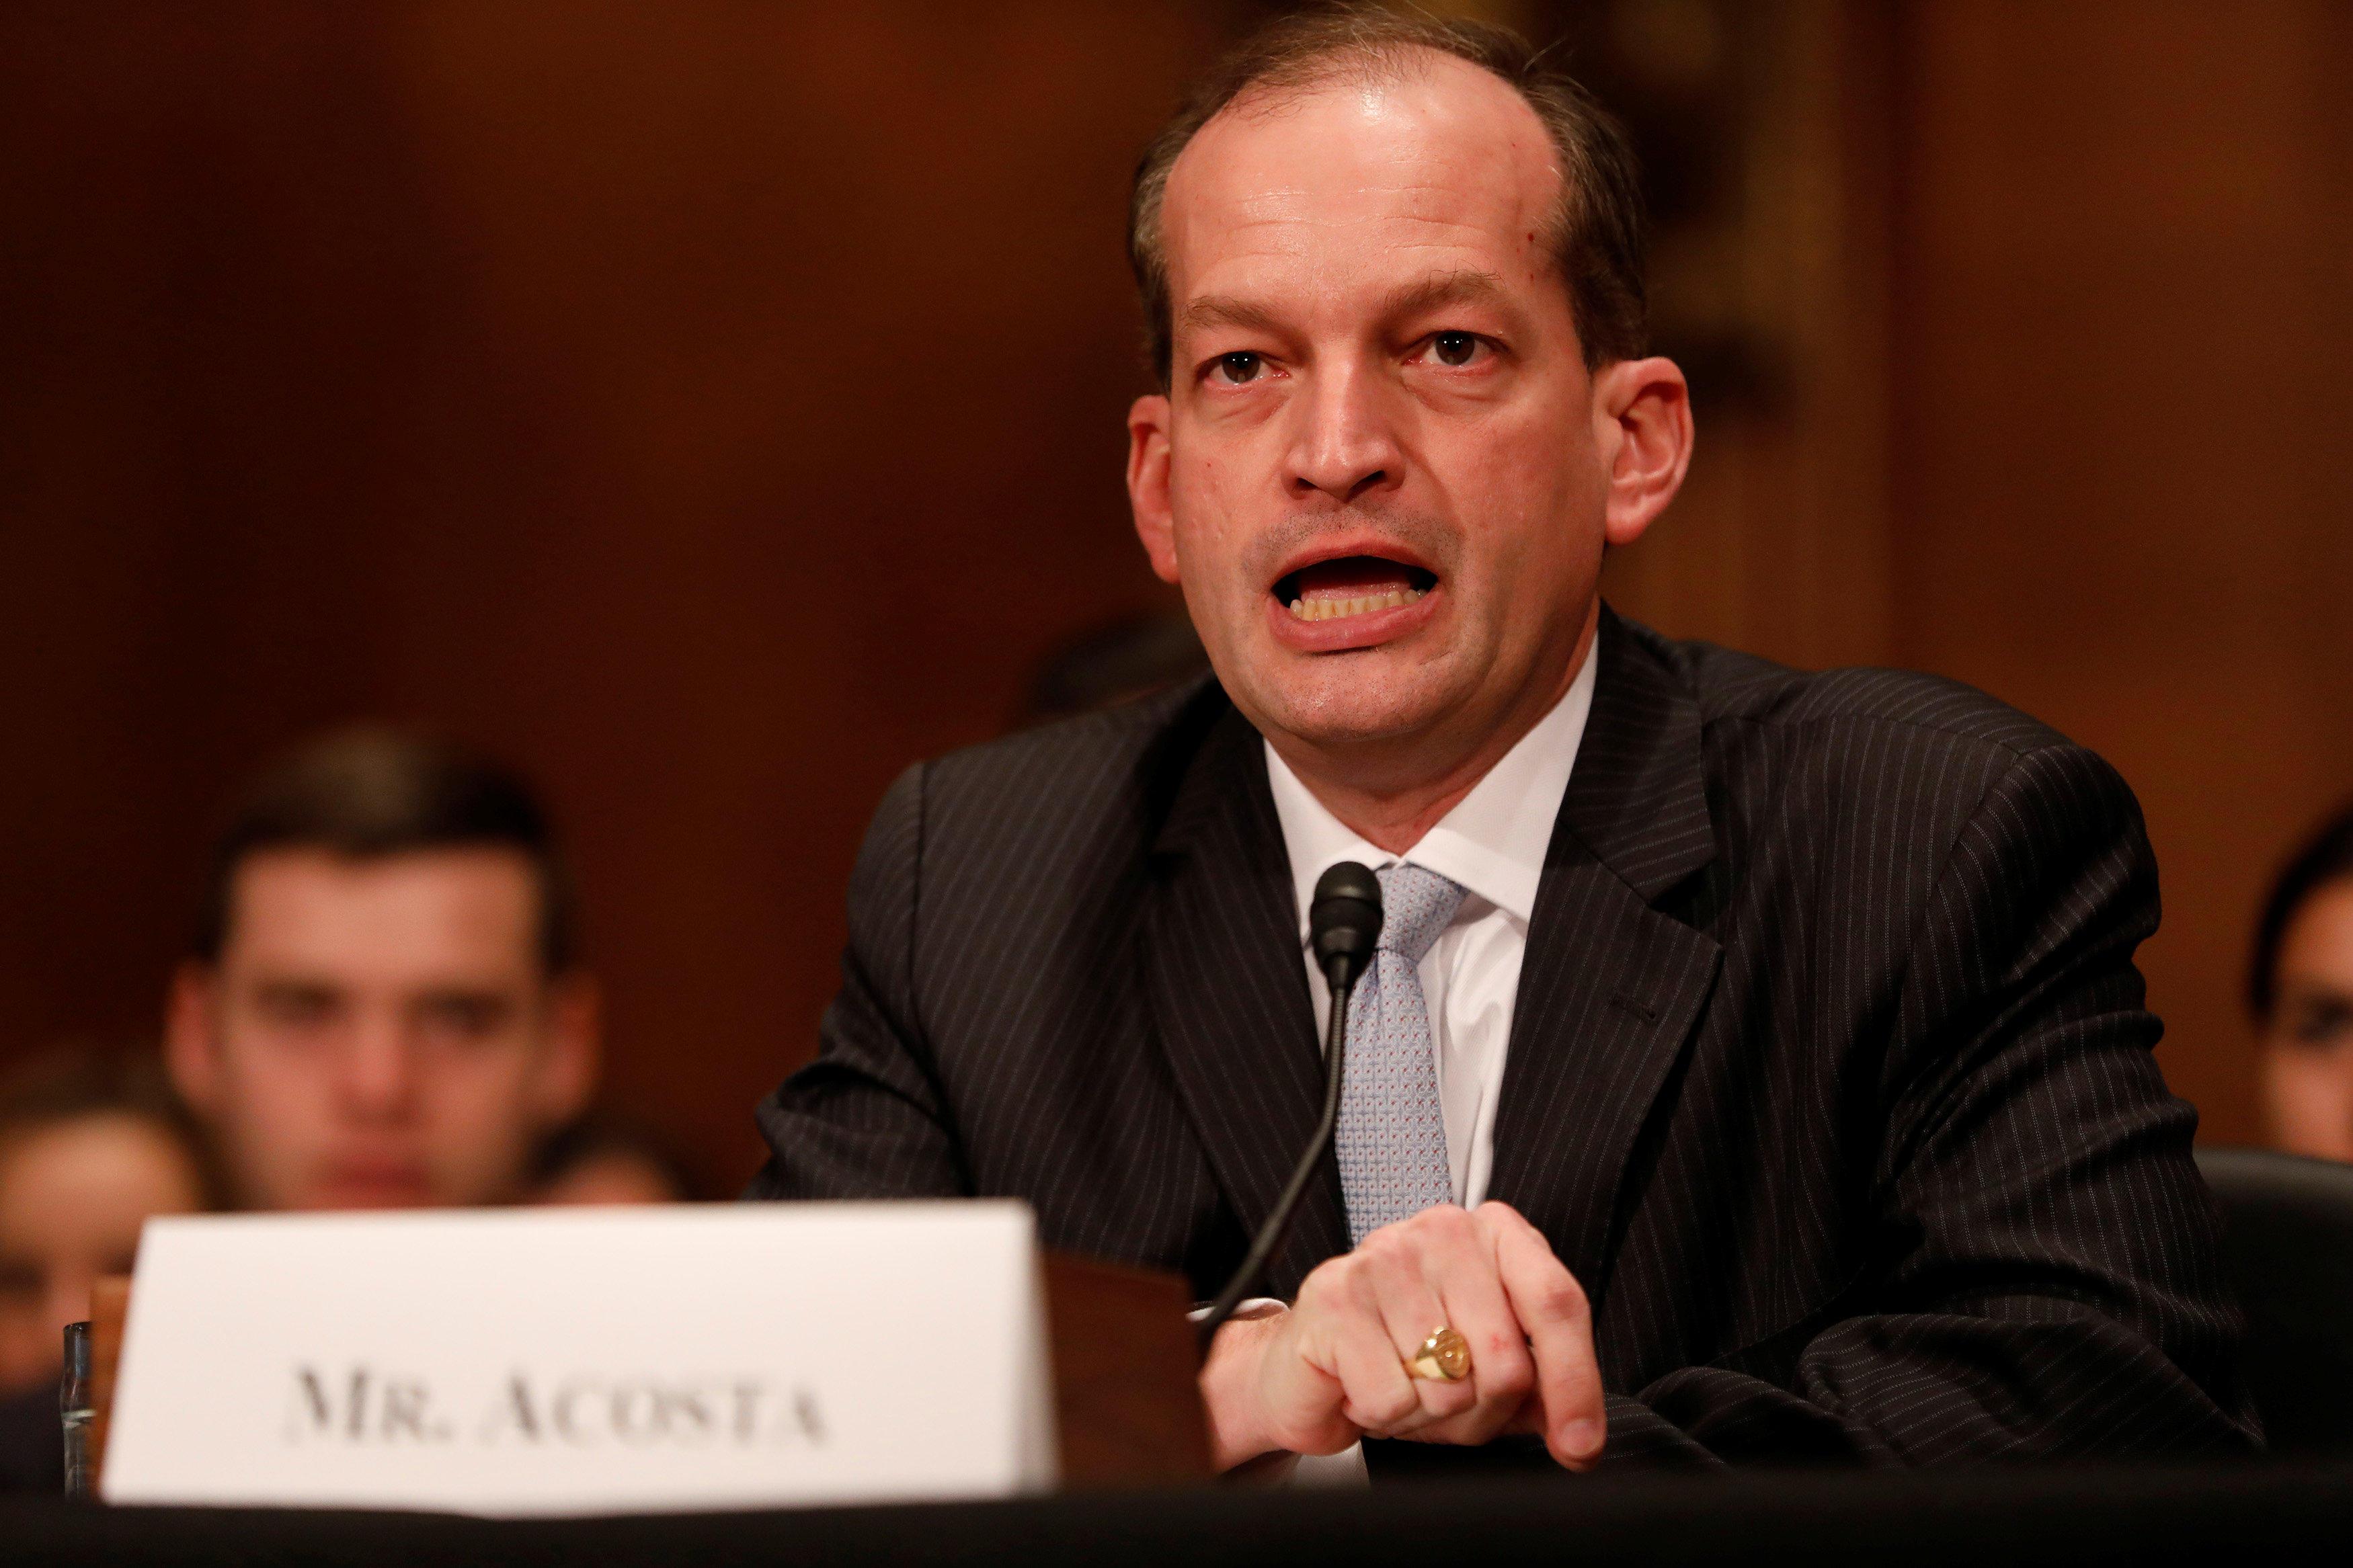 Senate confirms Alex Acosta as labor secretary, filling out Trump's cabinet